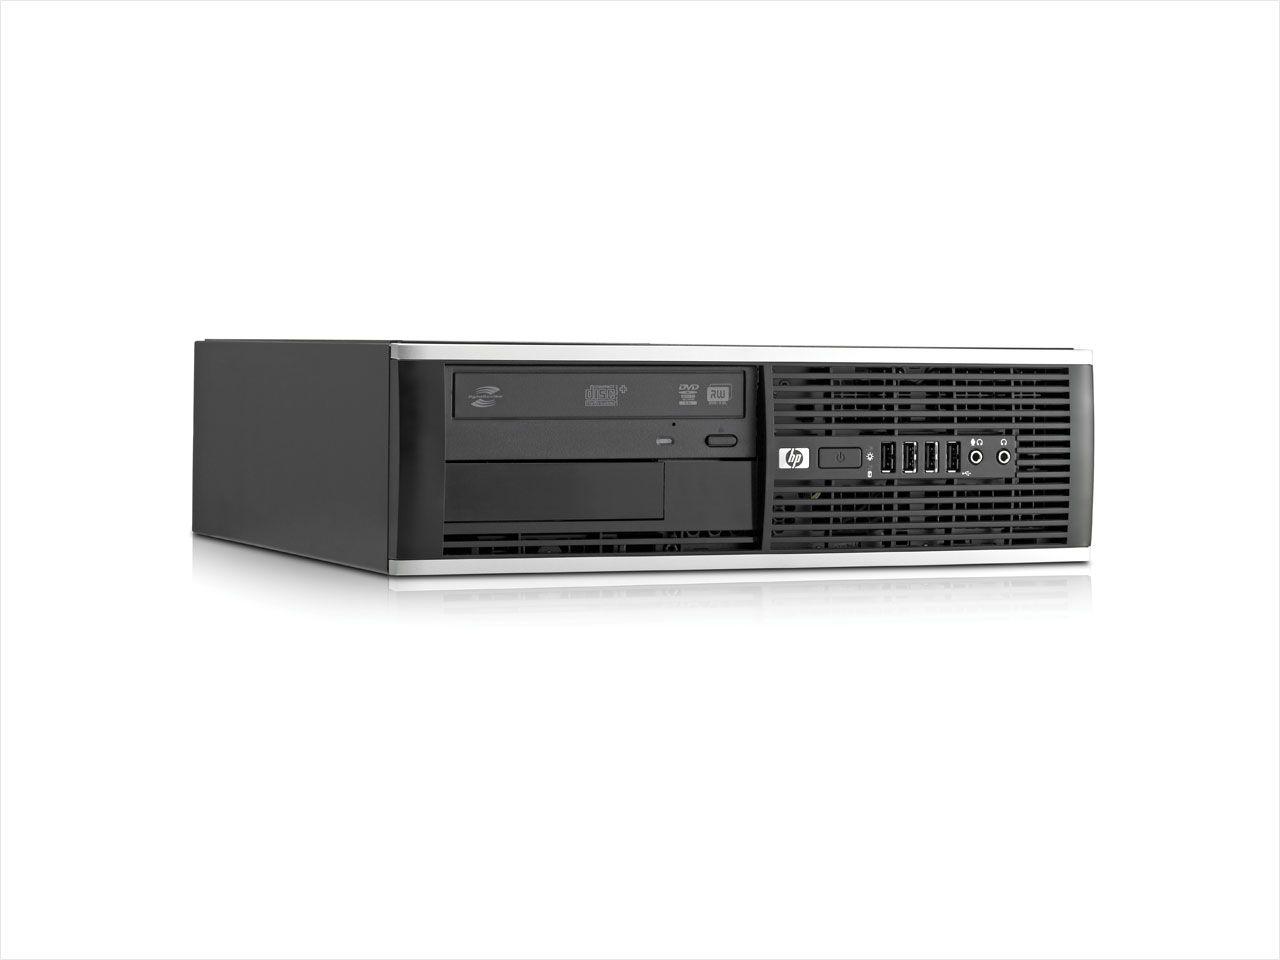 Refurb HP i5 8GB/2TB W7Pro $249 Shipped NeweggFlash